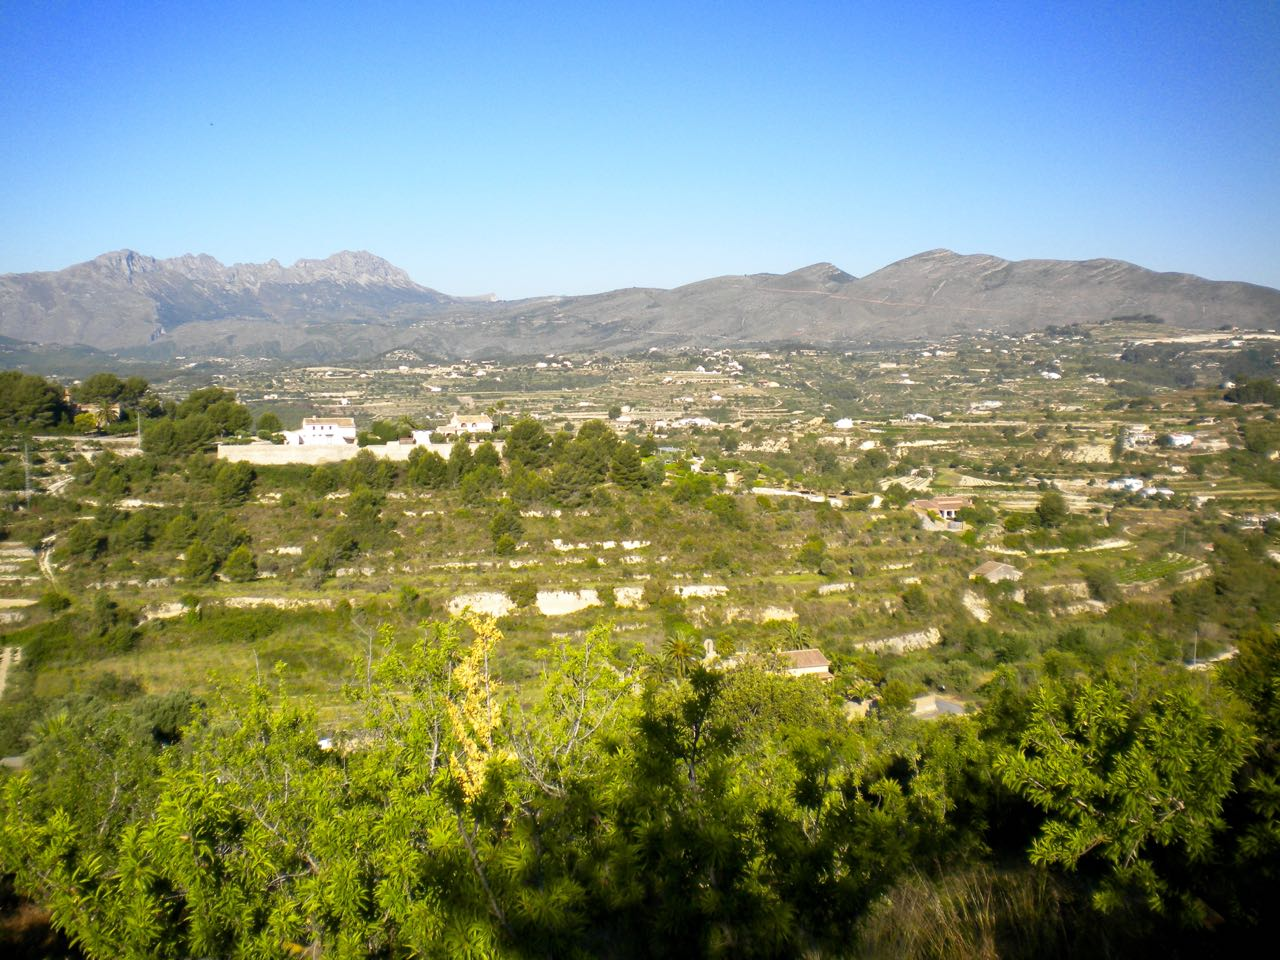 Land for building For Sale in Benissa, Alicante (Costa Blanca)